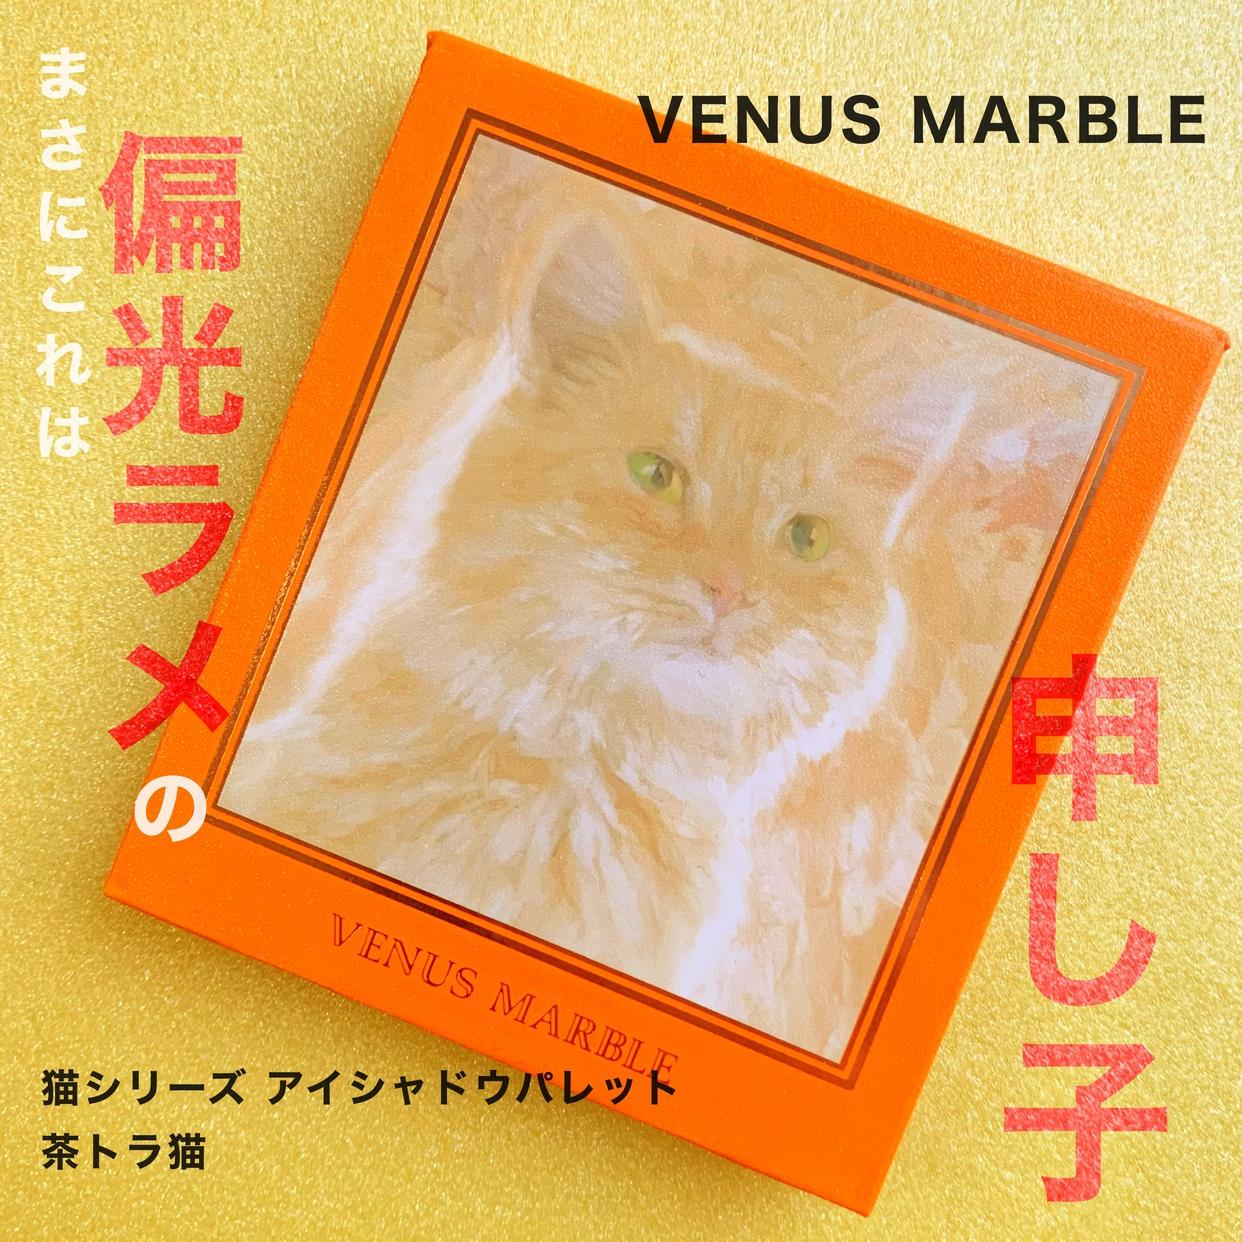 VENUS MARBLE(ヴィーナスマーブル)キャットシリーズアイシャドウパレットを使ったKeiさんのクチコミ画像